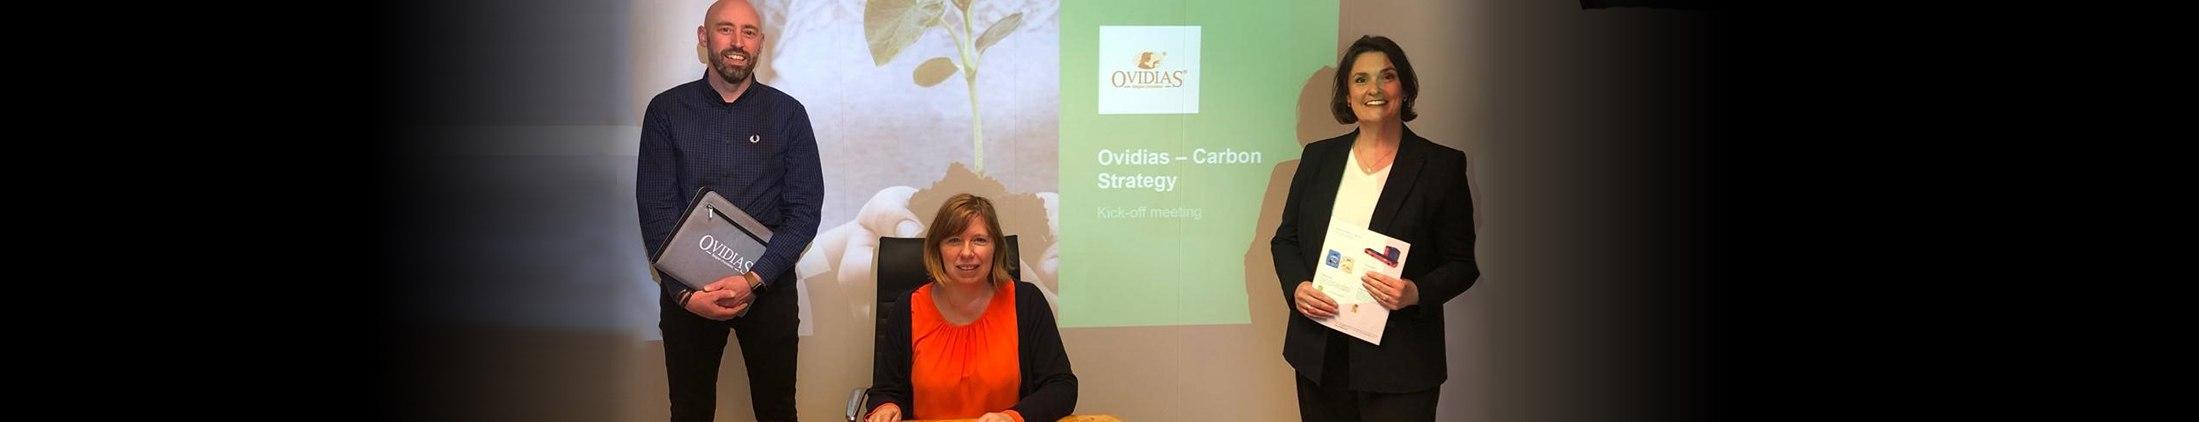 Ovidias joins ambitious CO2 reduction plan